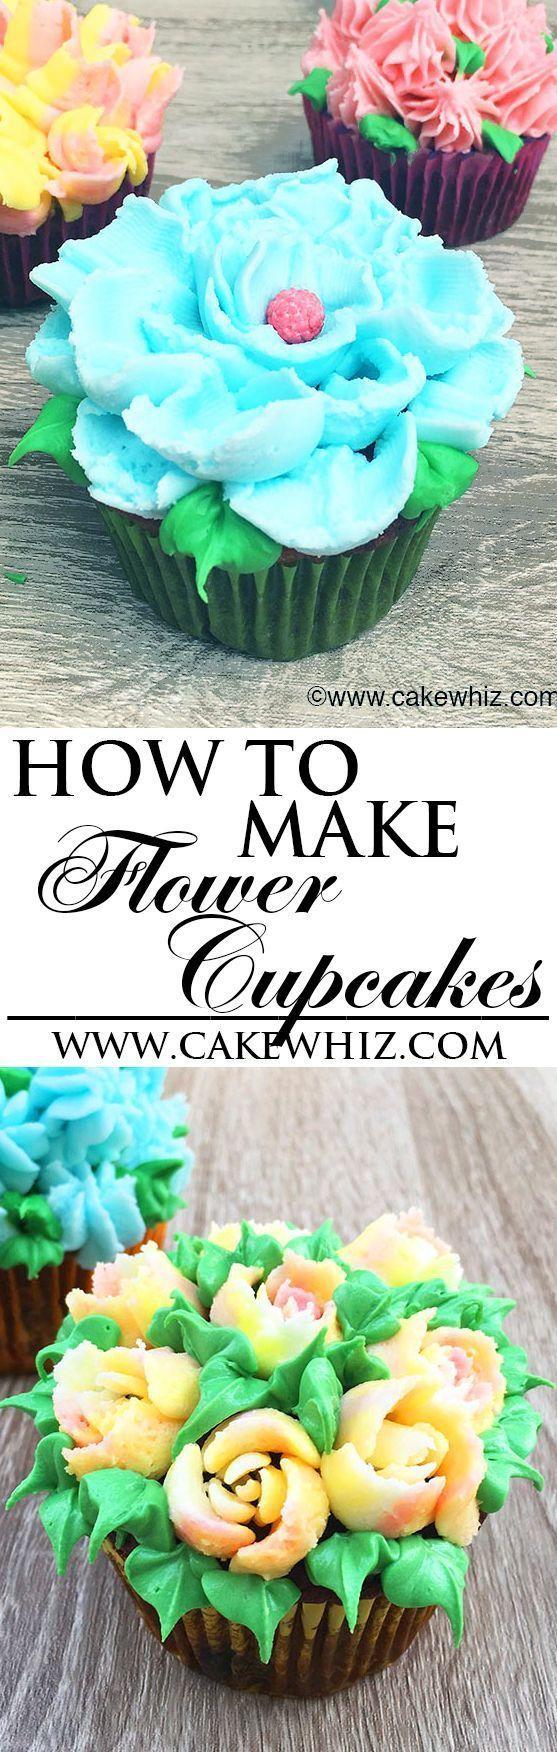 best 25+ beginner cake decorating ideas on pinterest | icing tips